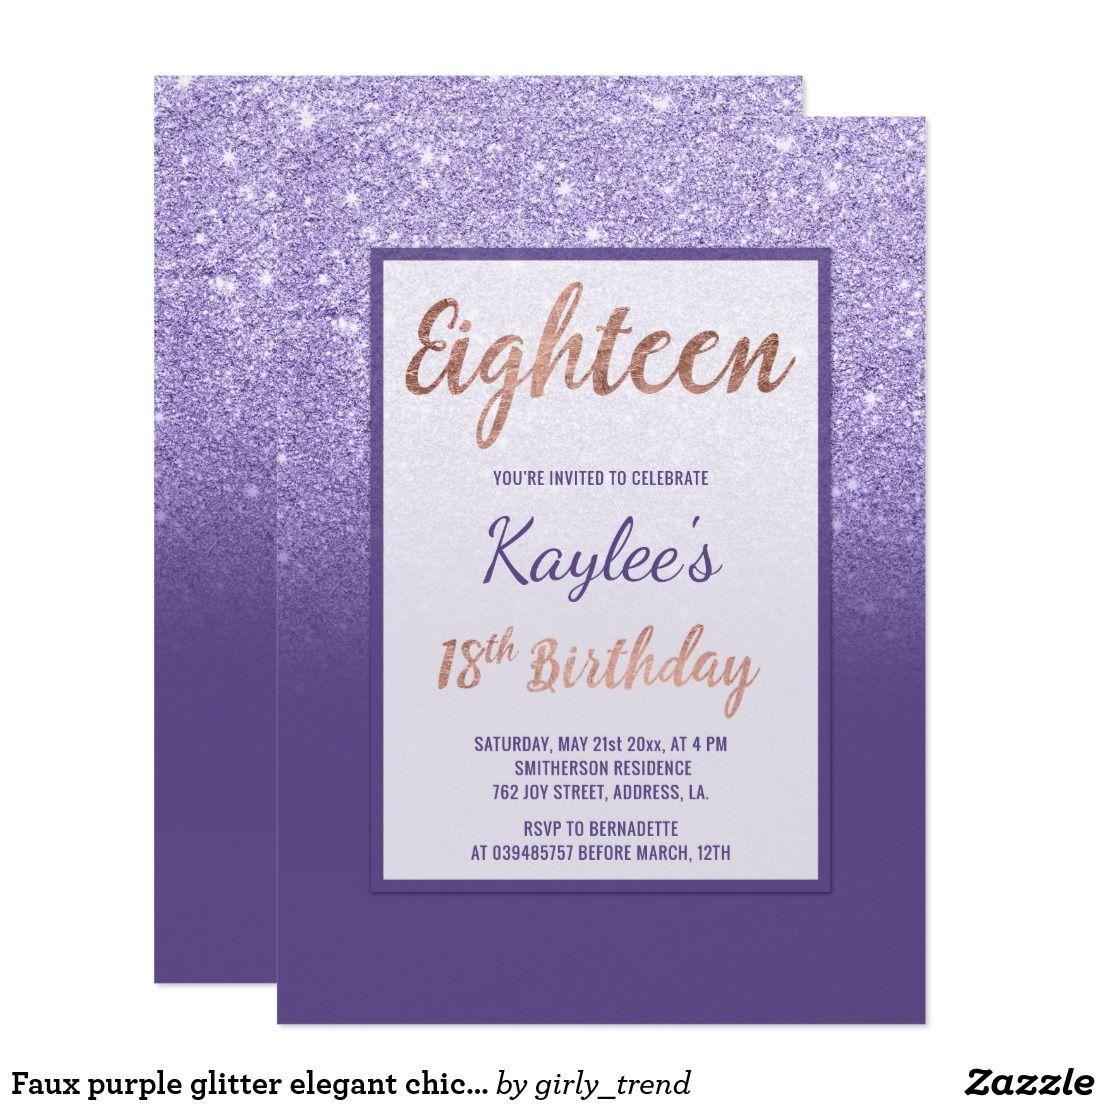 Faux purple glitter elegant chic 18th Birthday Invitation